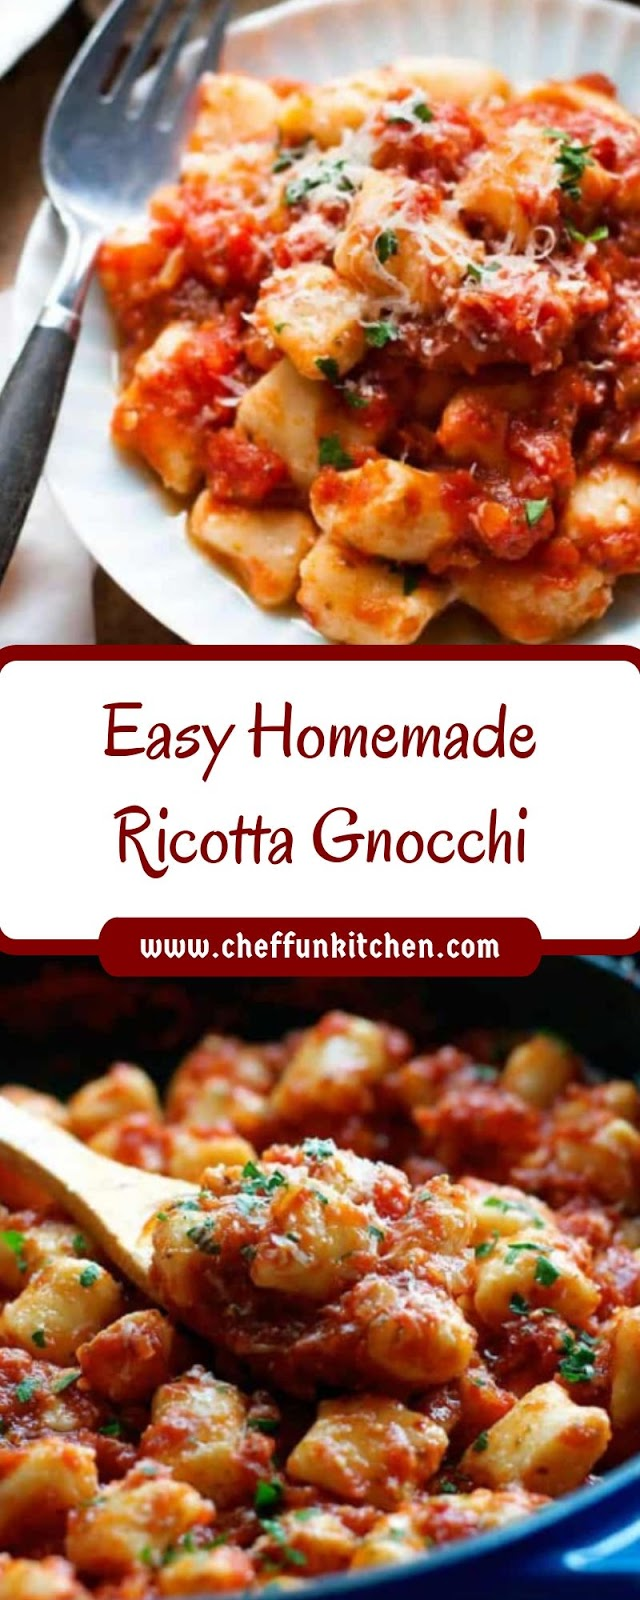 Easy Homemade Ricotta Gnocchi